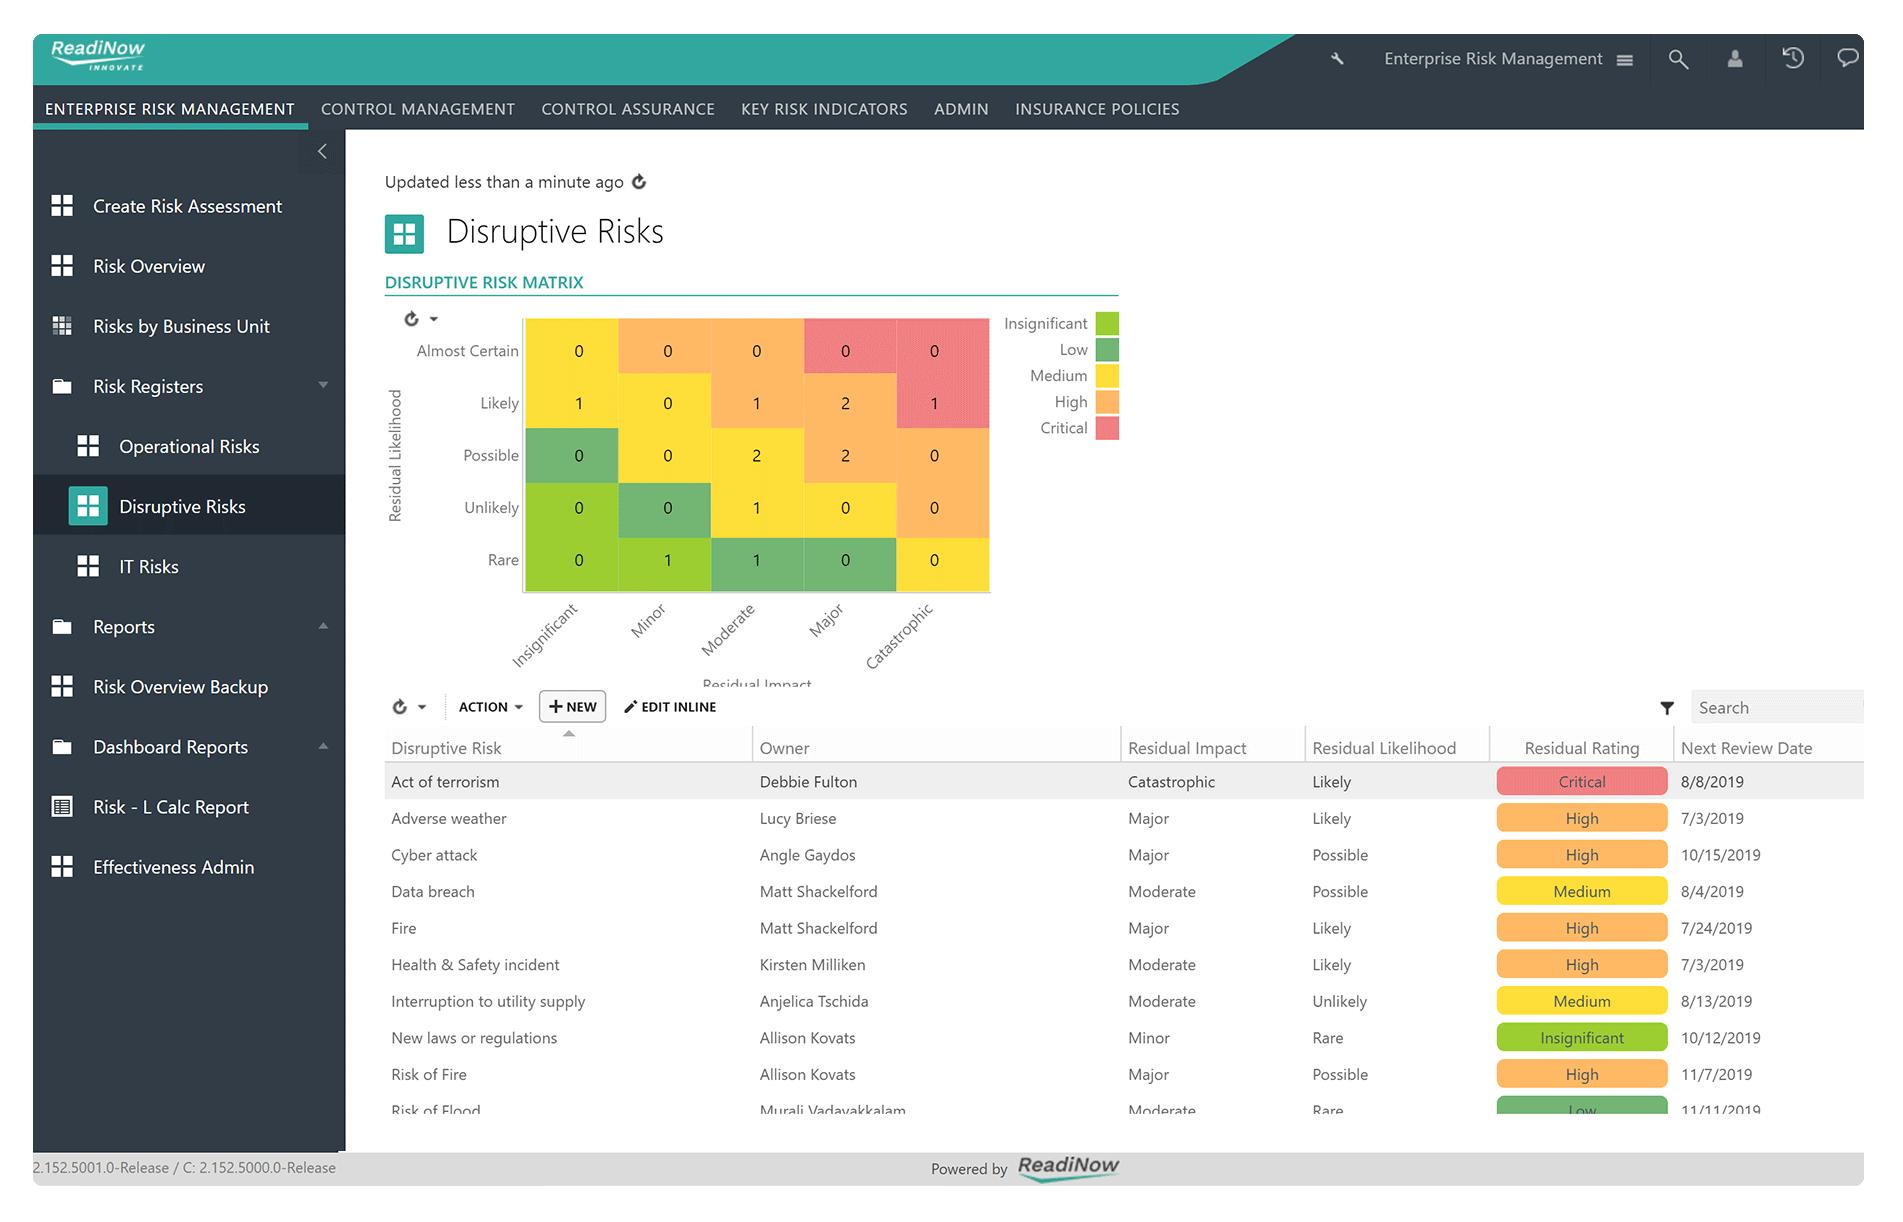 ERM-risk-registers